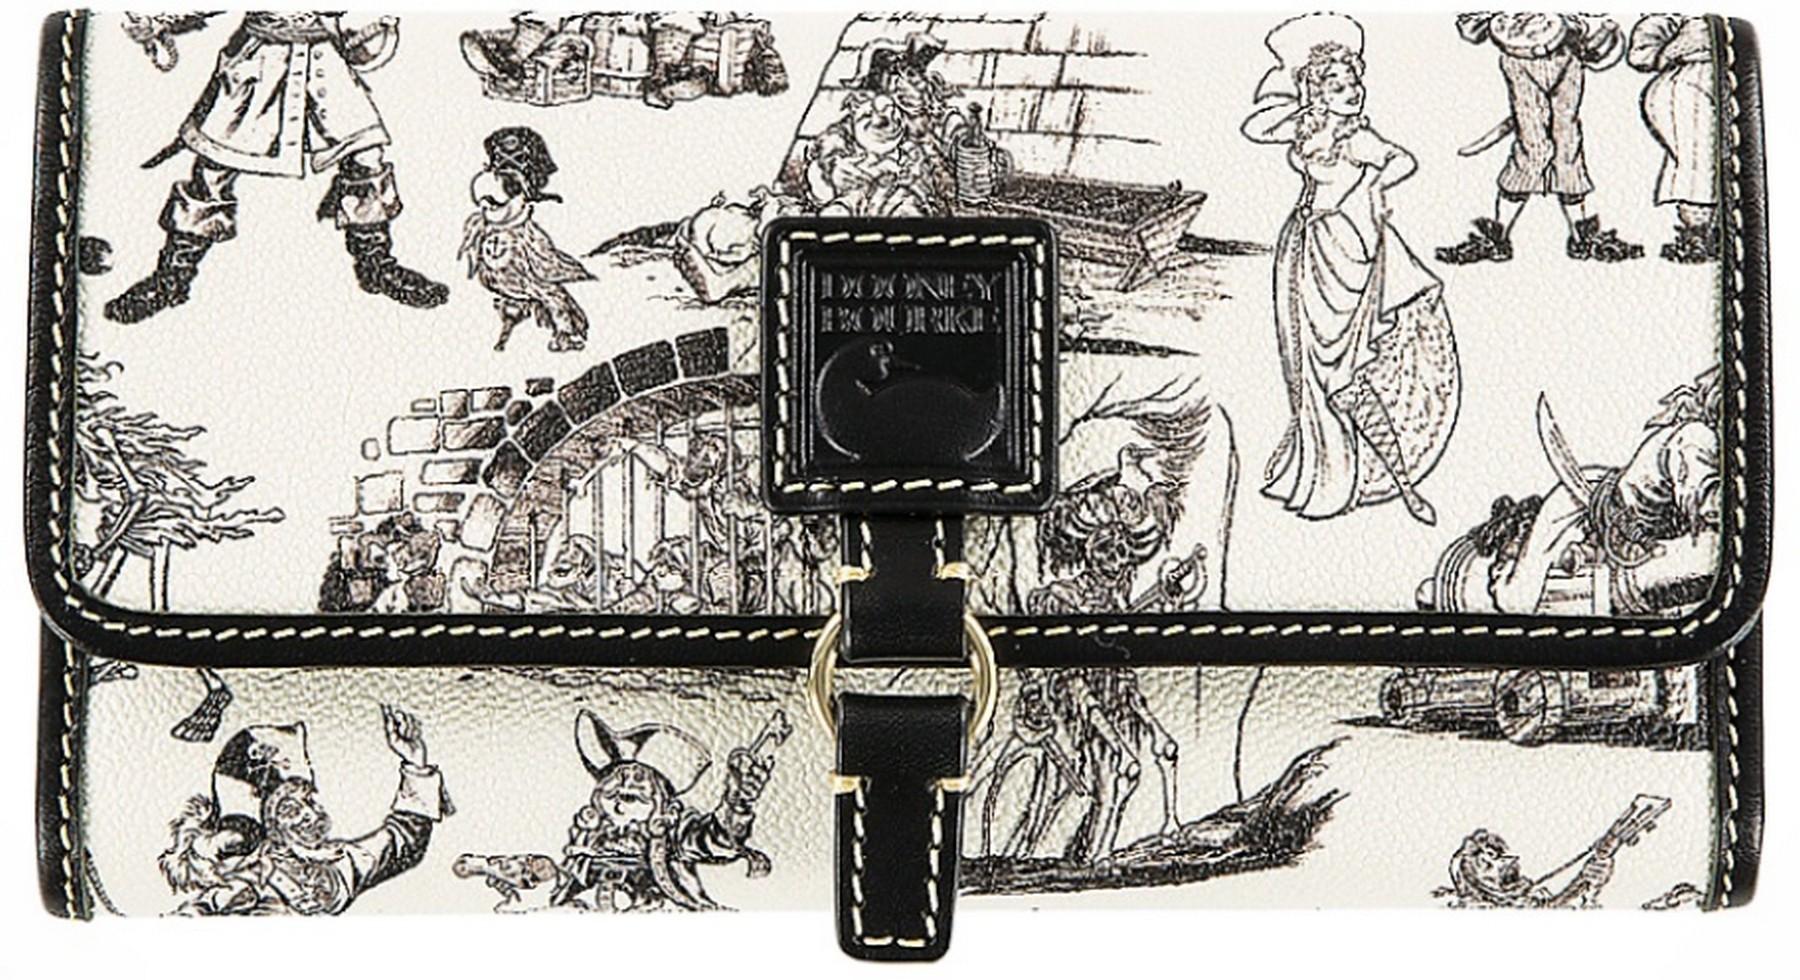 Dooney & Bourke Pirates of the Caribbean Checkbook Wallet - Disney World Exclusive © Dizdude.com